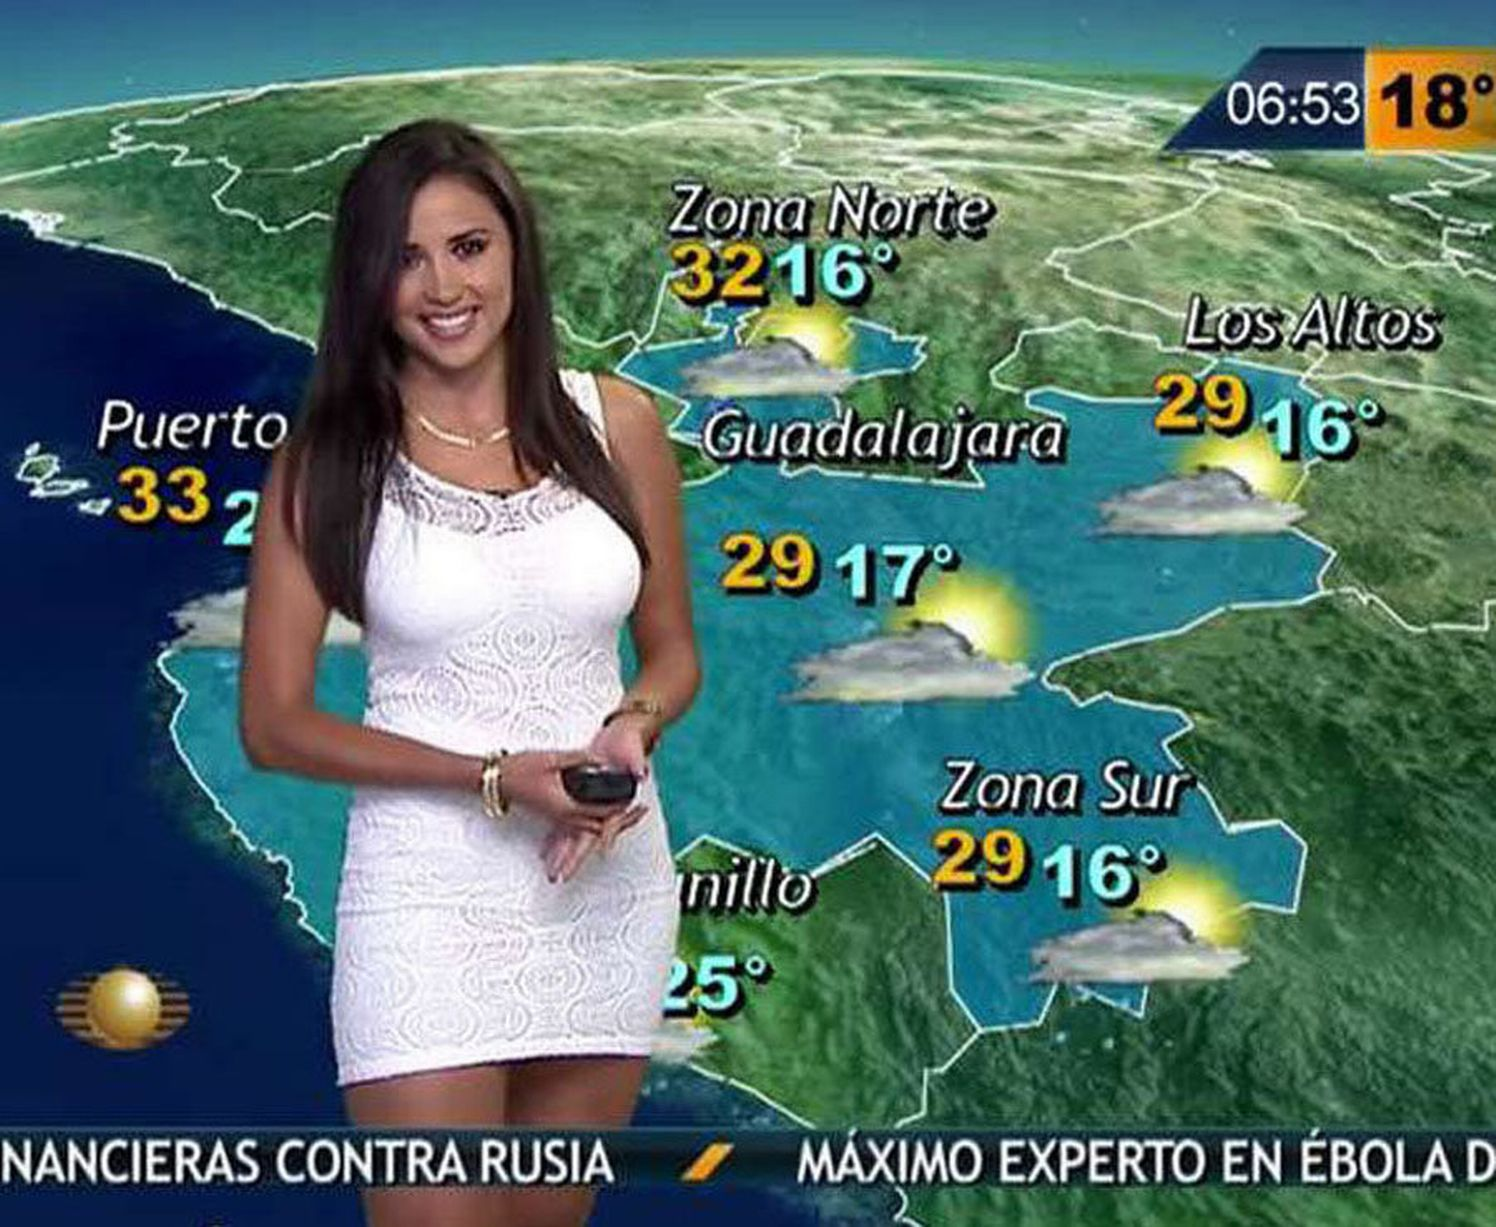 Mexican weather reporter Susana Almeida